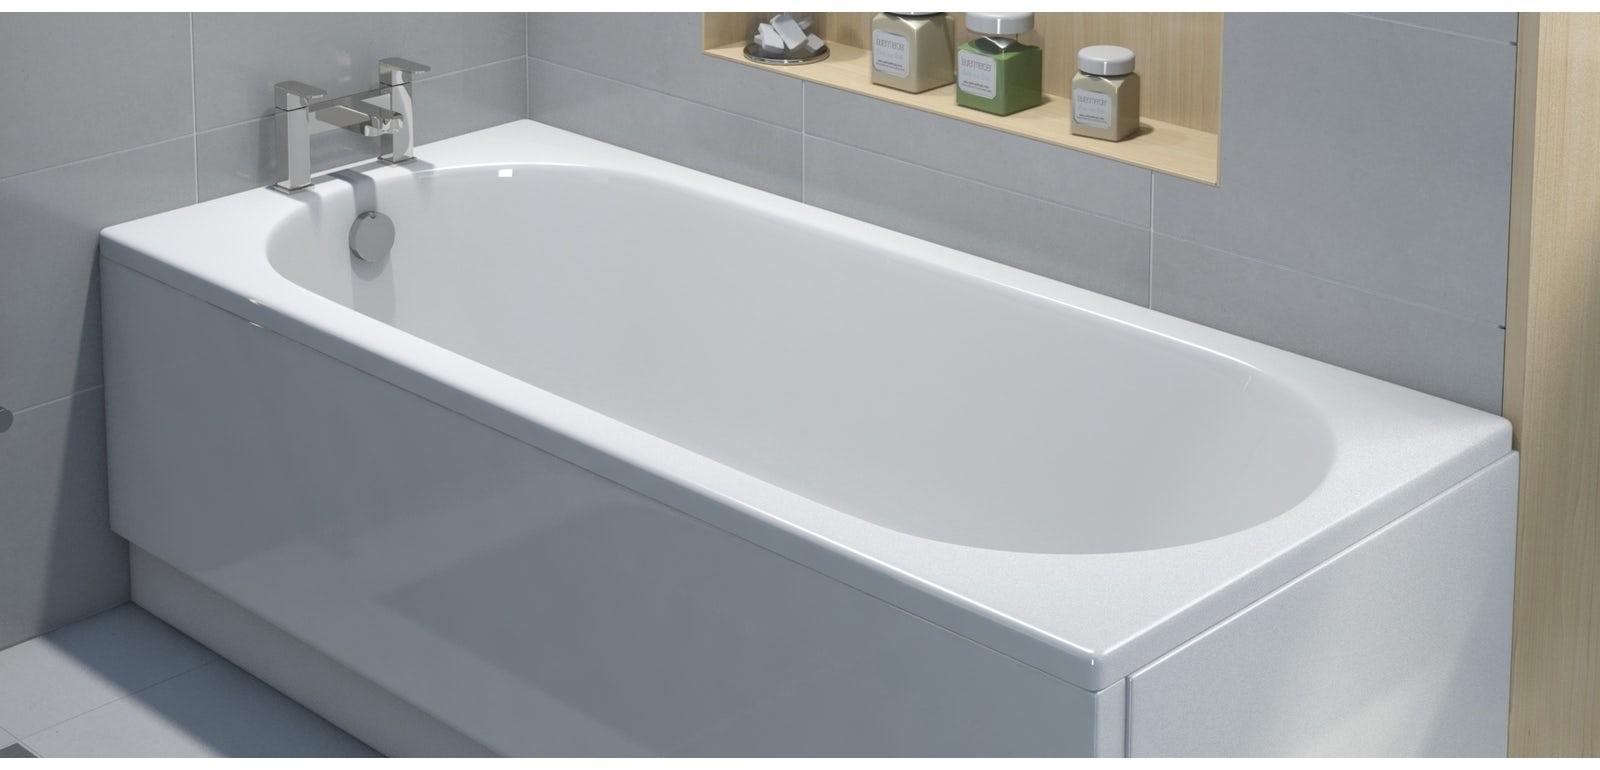 Best Bathtub Dimensions Tips Directions On Bathroom Dimensions